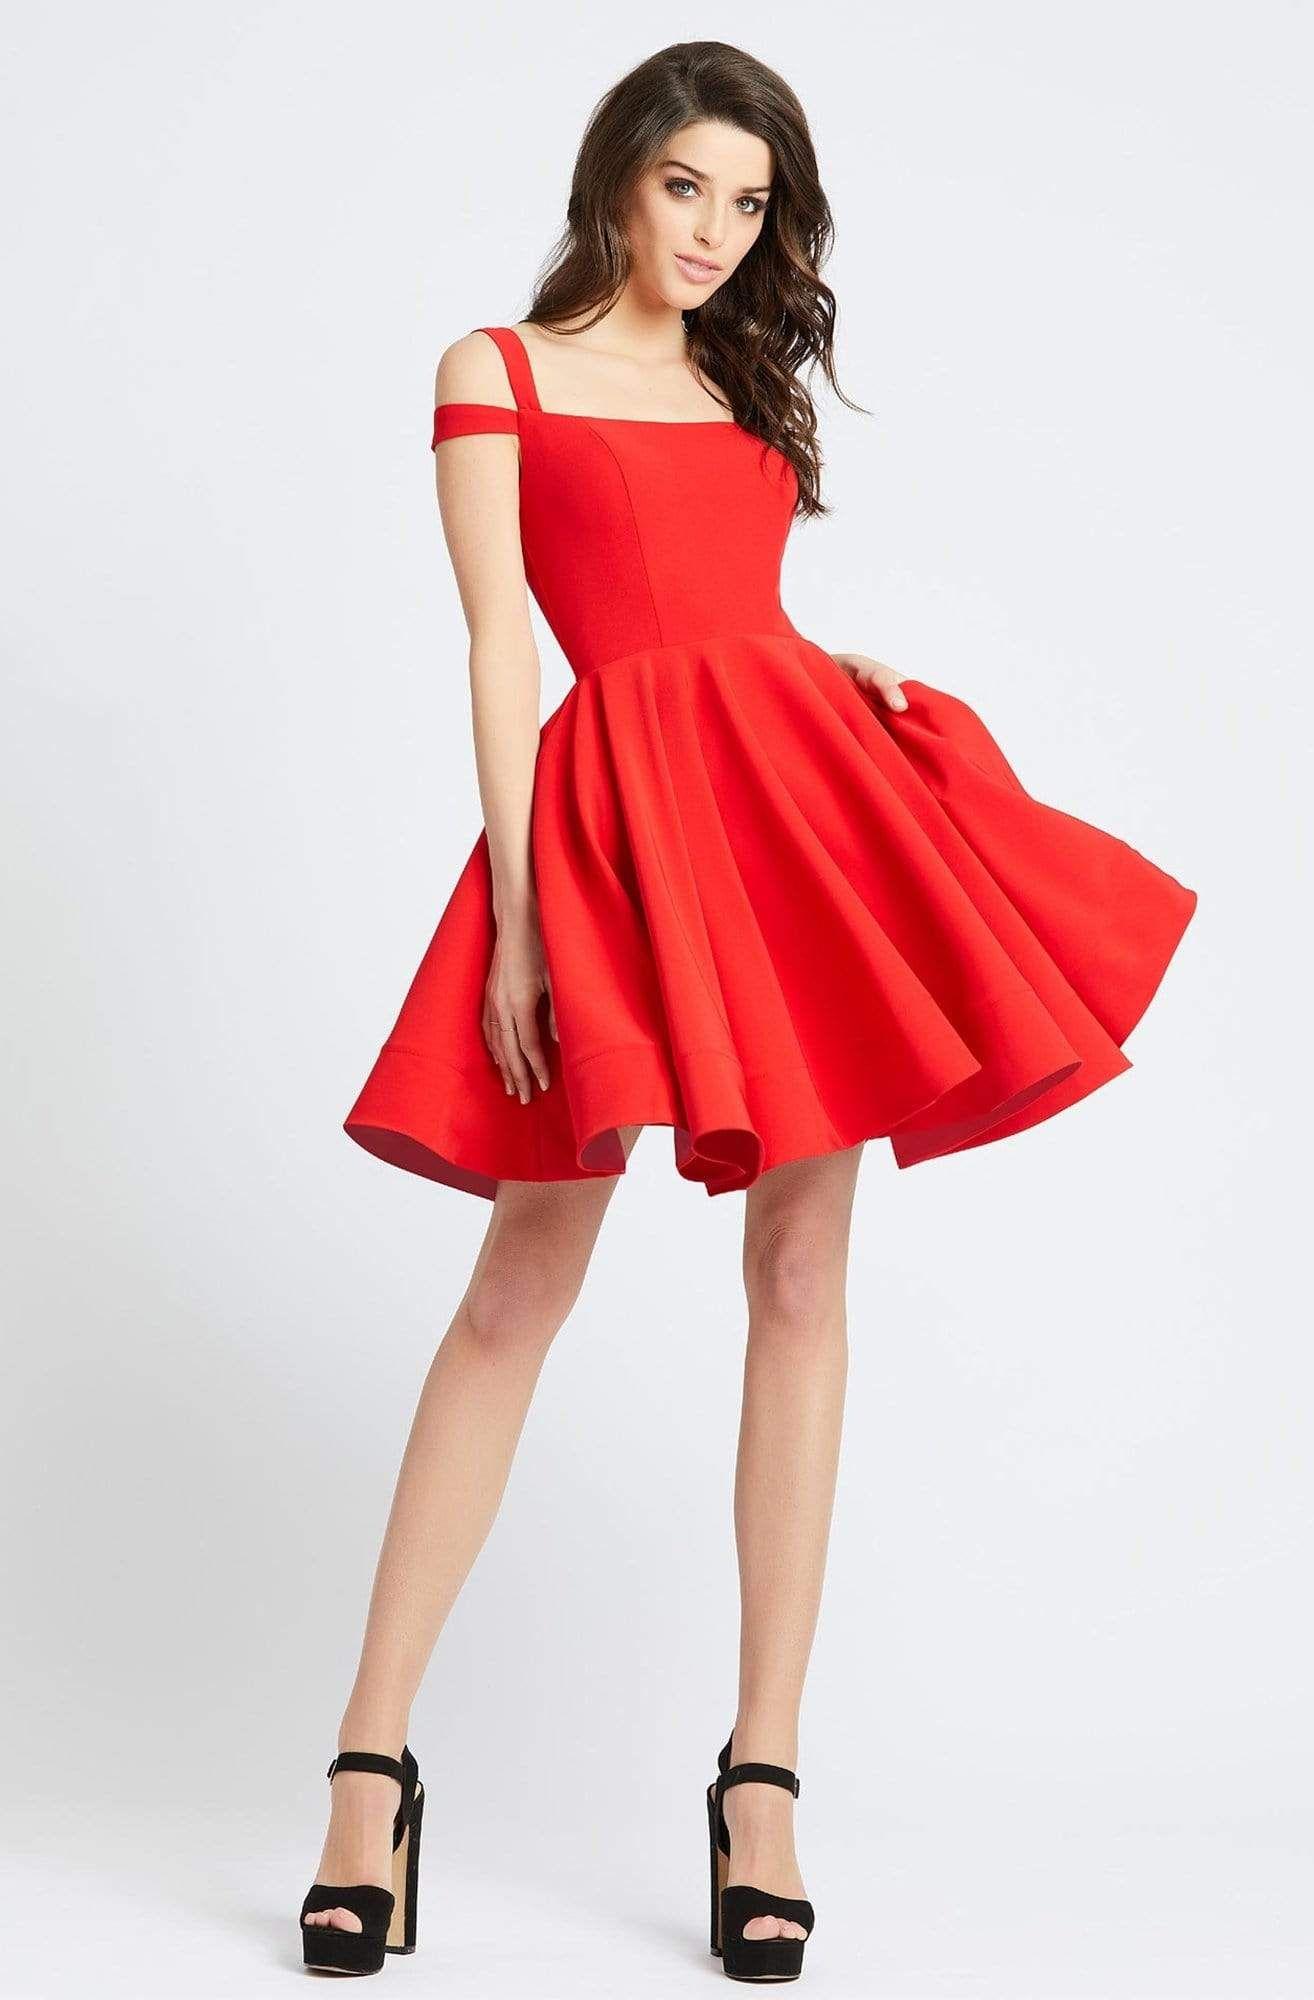 Ieena Duggal 26077i Cold Shoulder Fit And Flare Cocktail Dress Fit And Flare Cocktail Dress Fit And Flare Dress Short Red Prom Dresses [ 2000 x 1314 Pixel ]